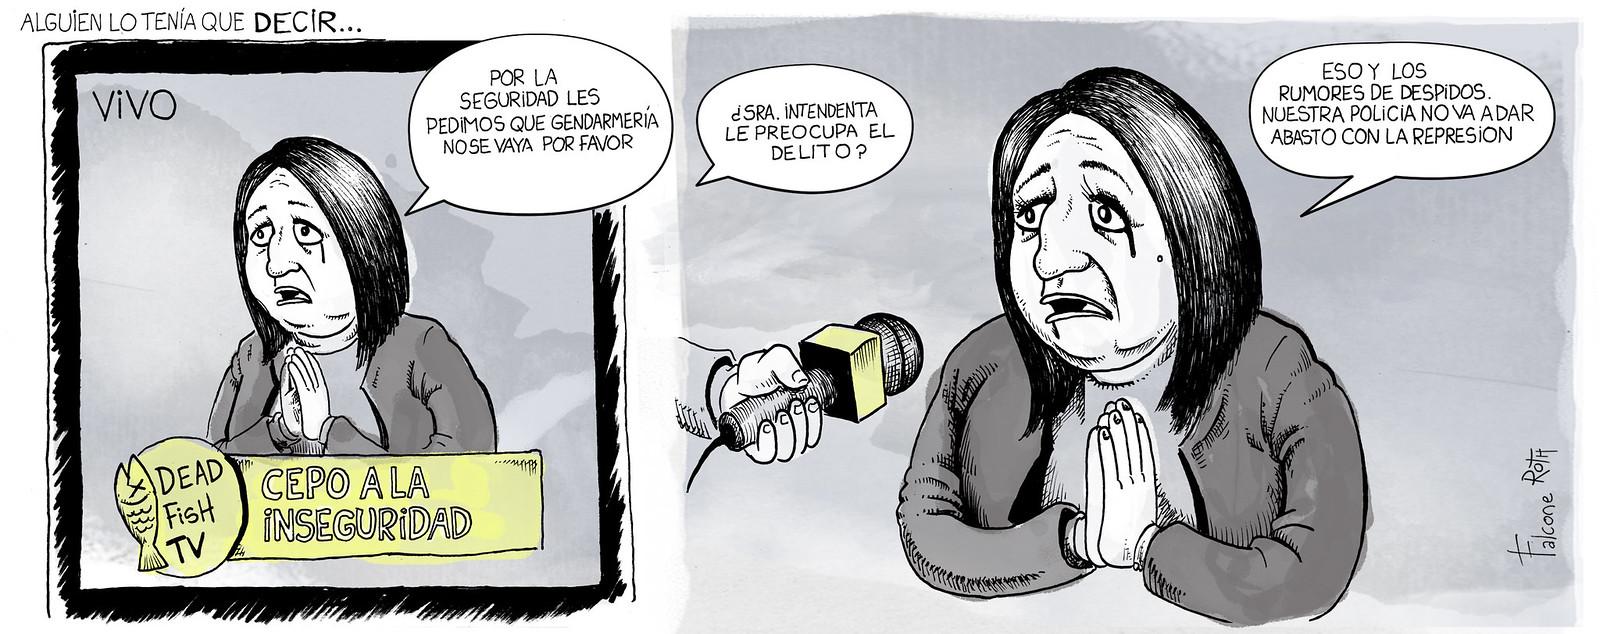 seguridad intendenta Mónica Fein